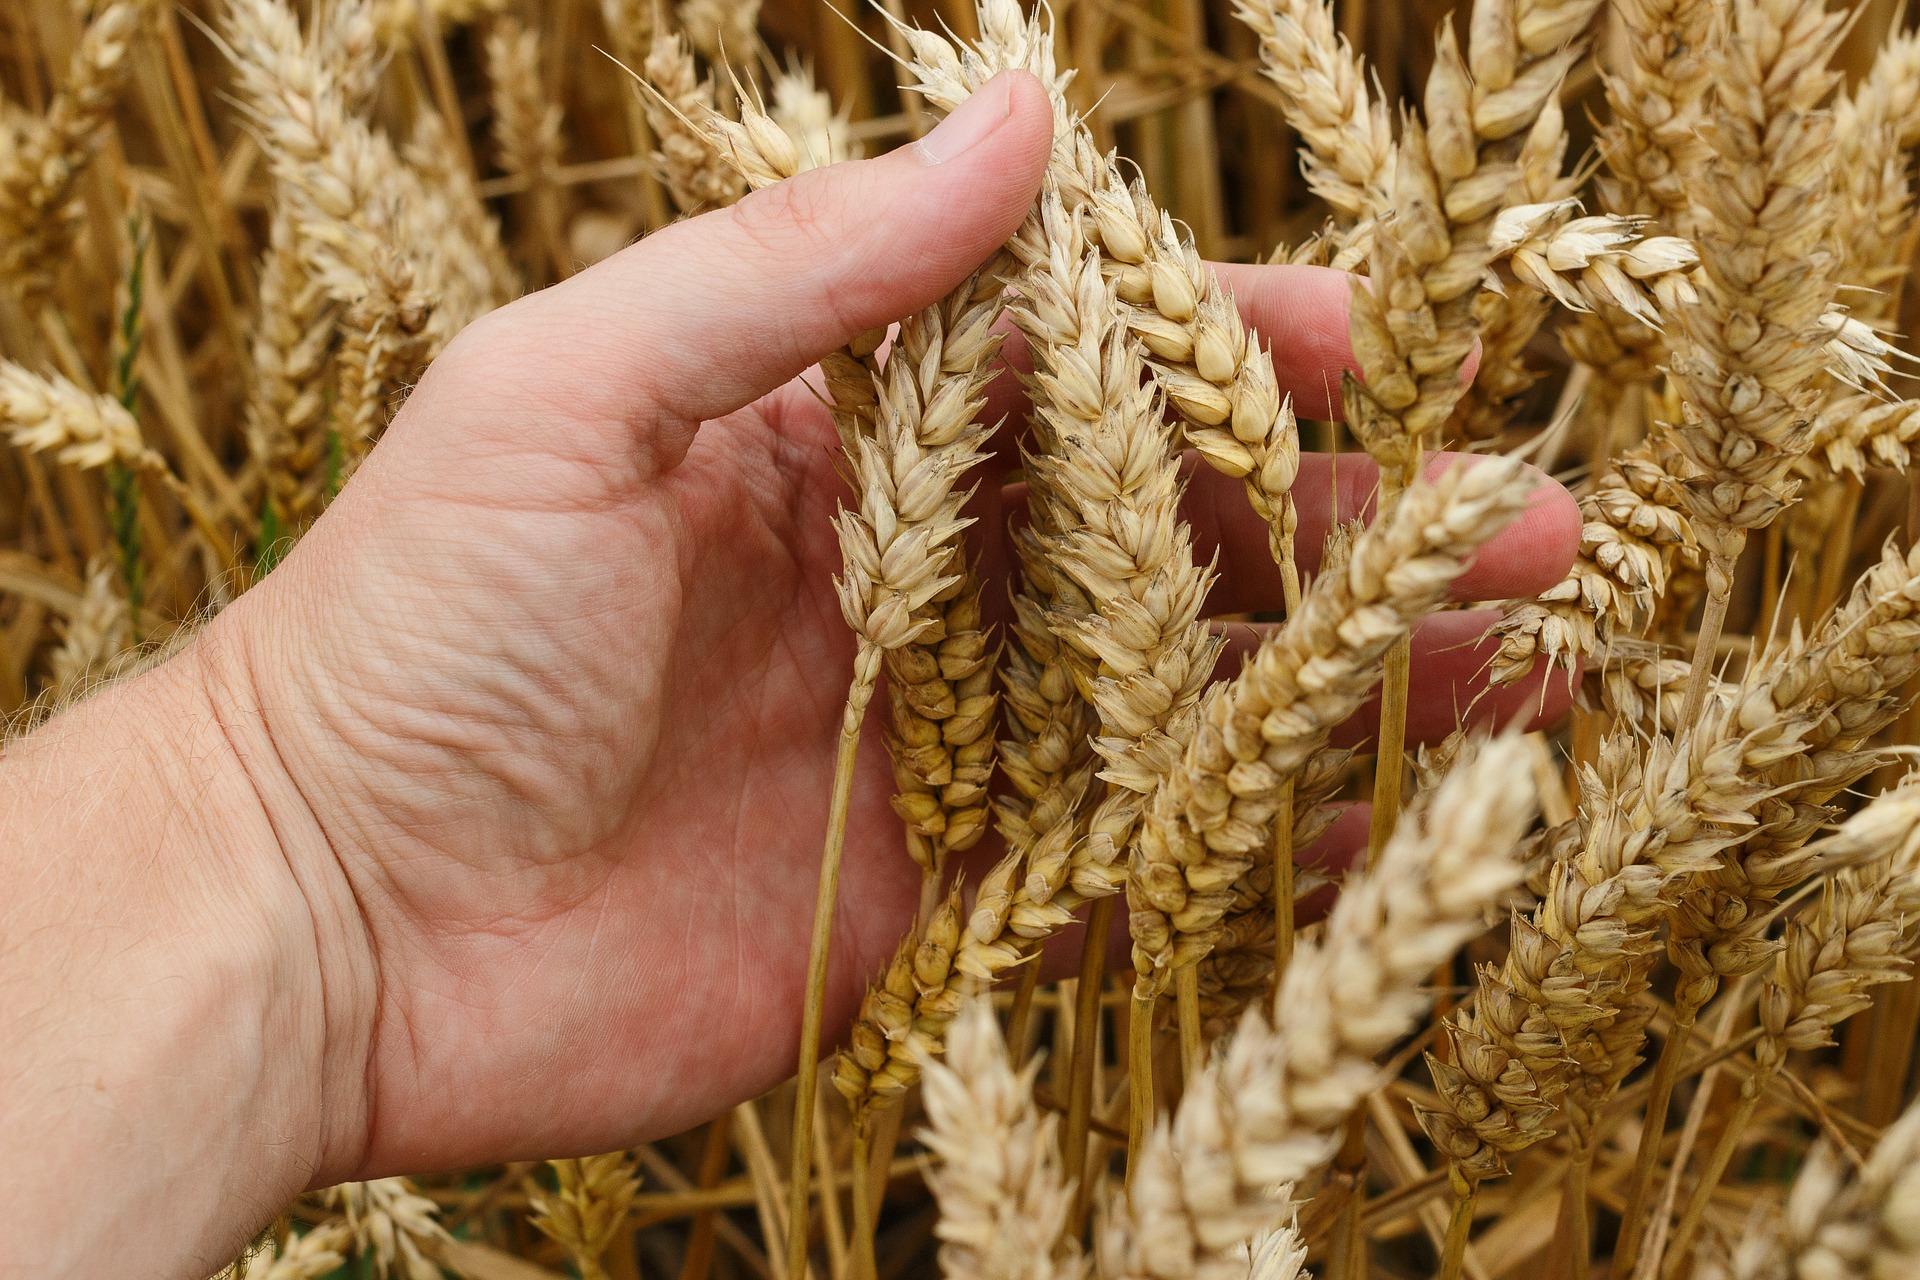 Dnipro Agro Group зібрав 91,6 тис. тонн озимих культур